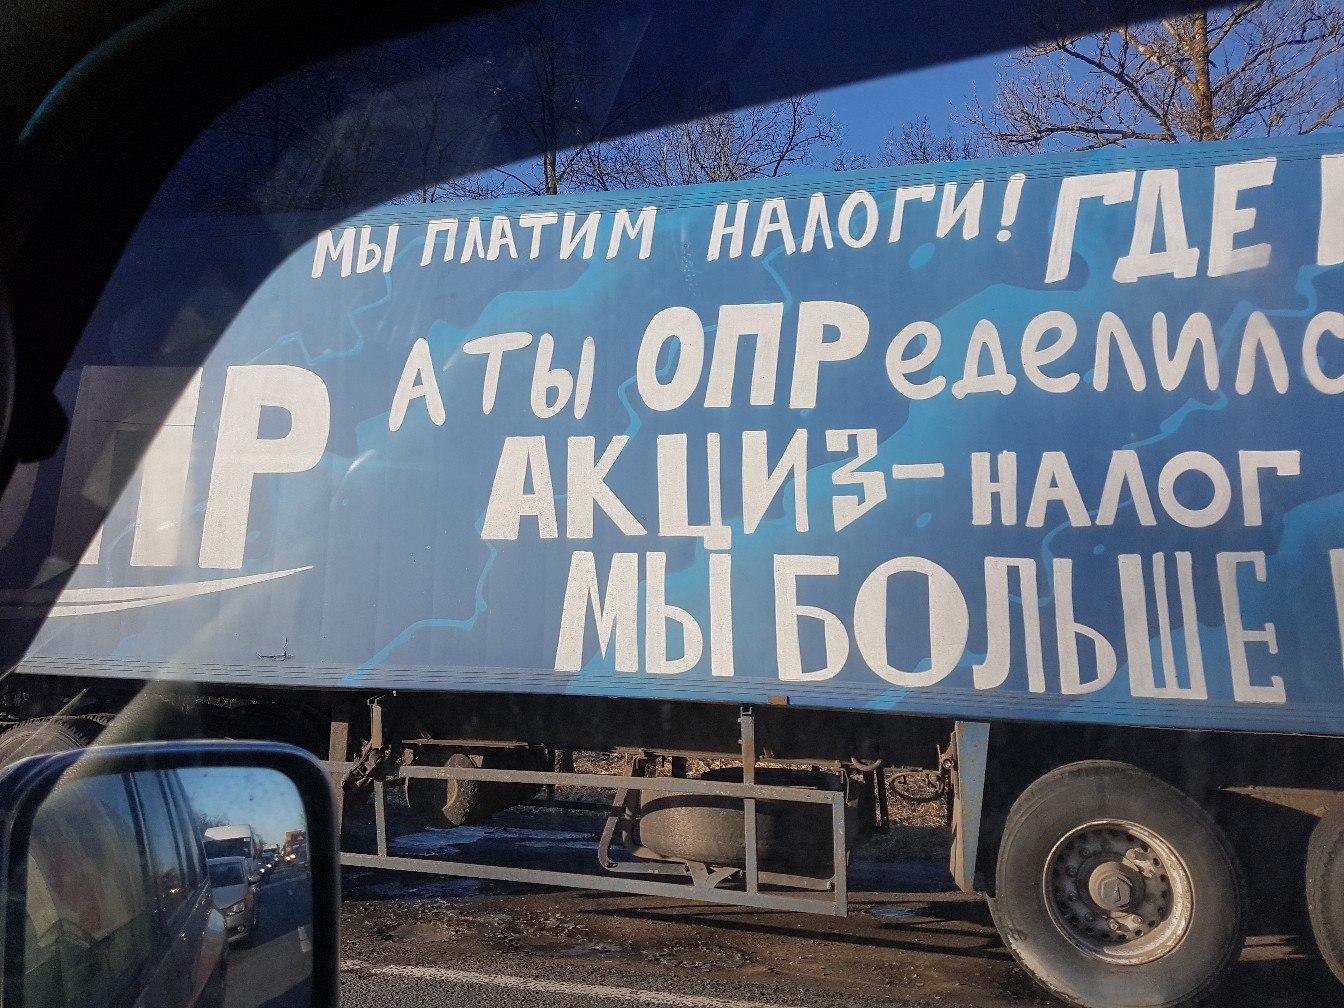 Фото: Александр Андреевич (vk.com/spb_today)